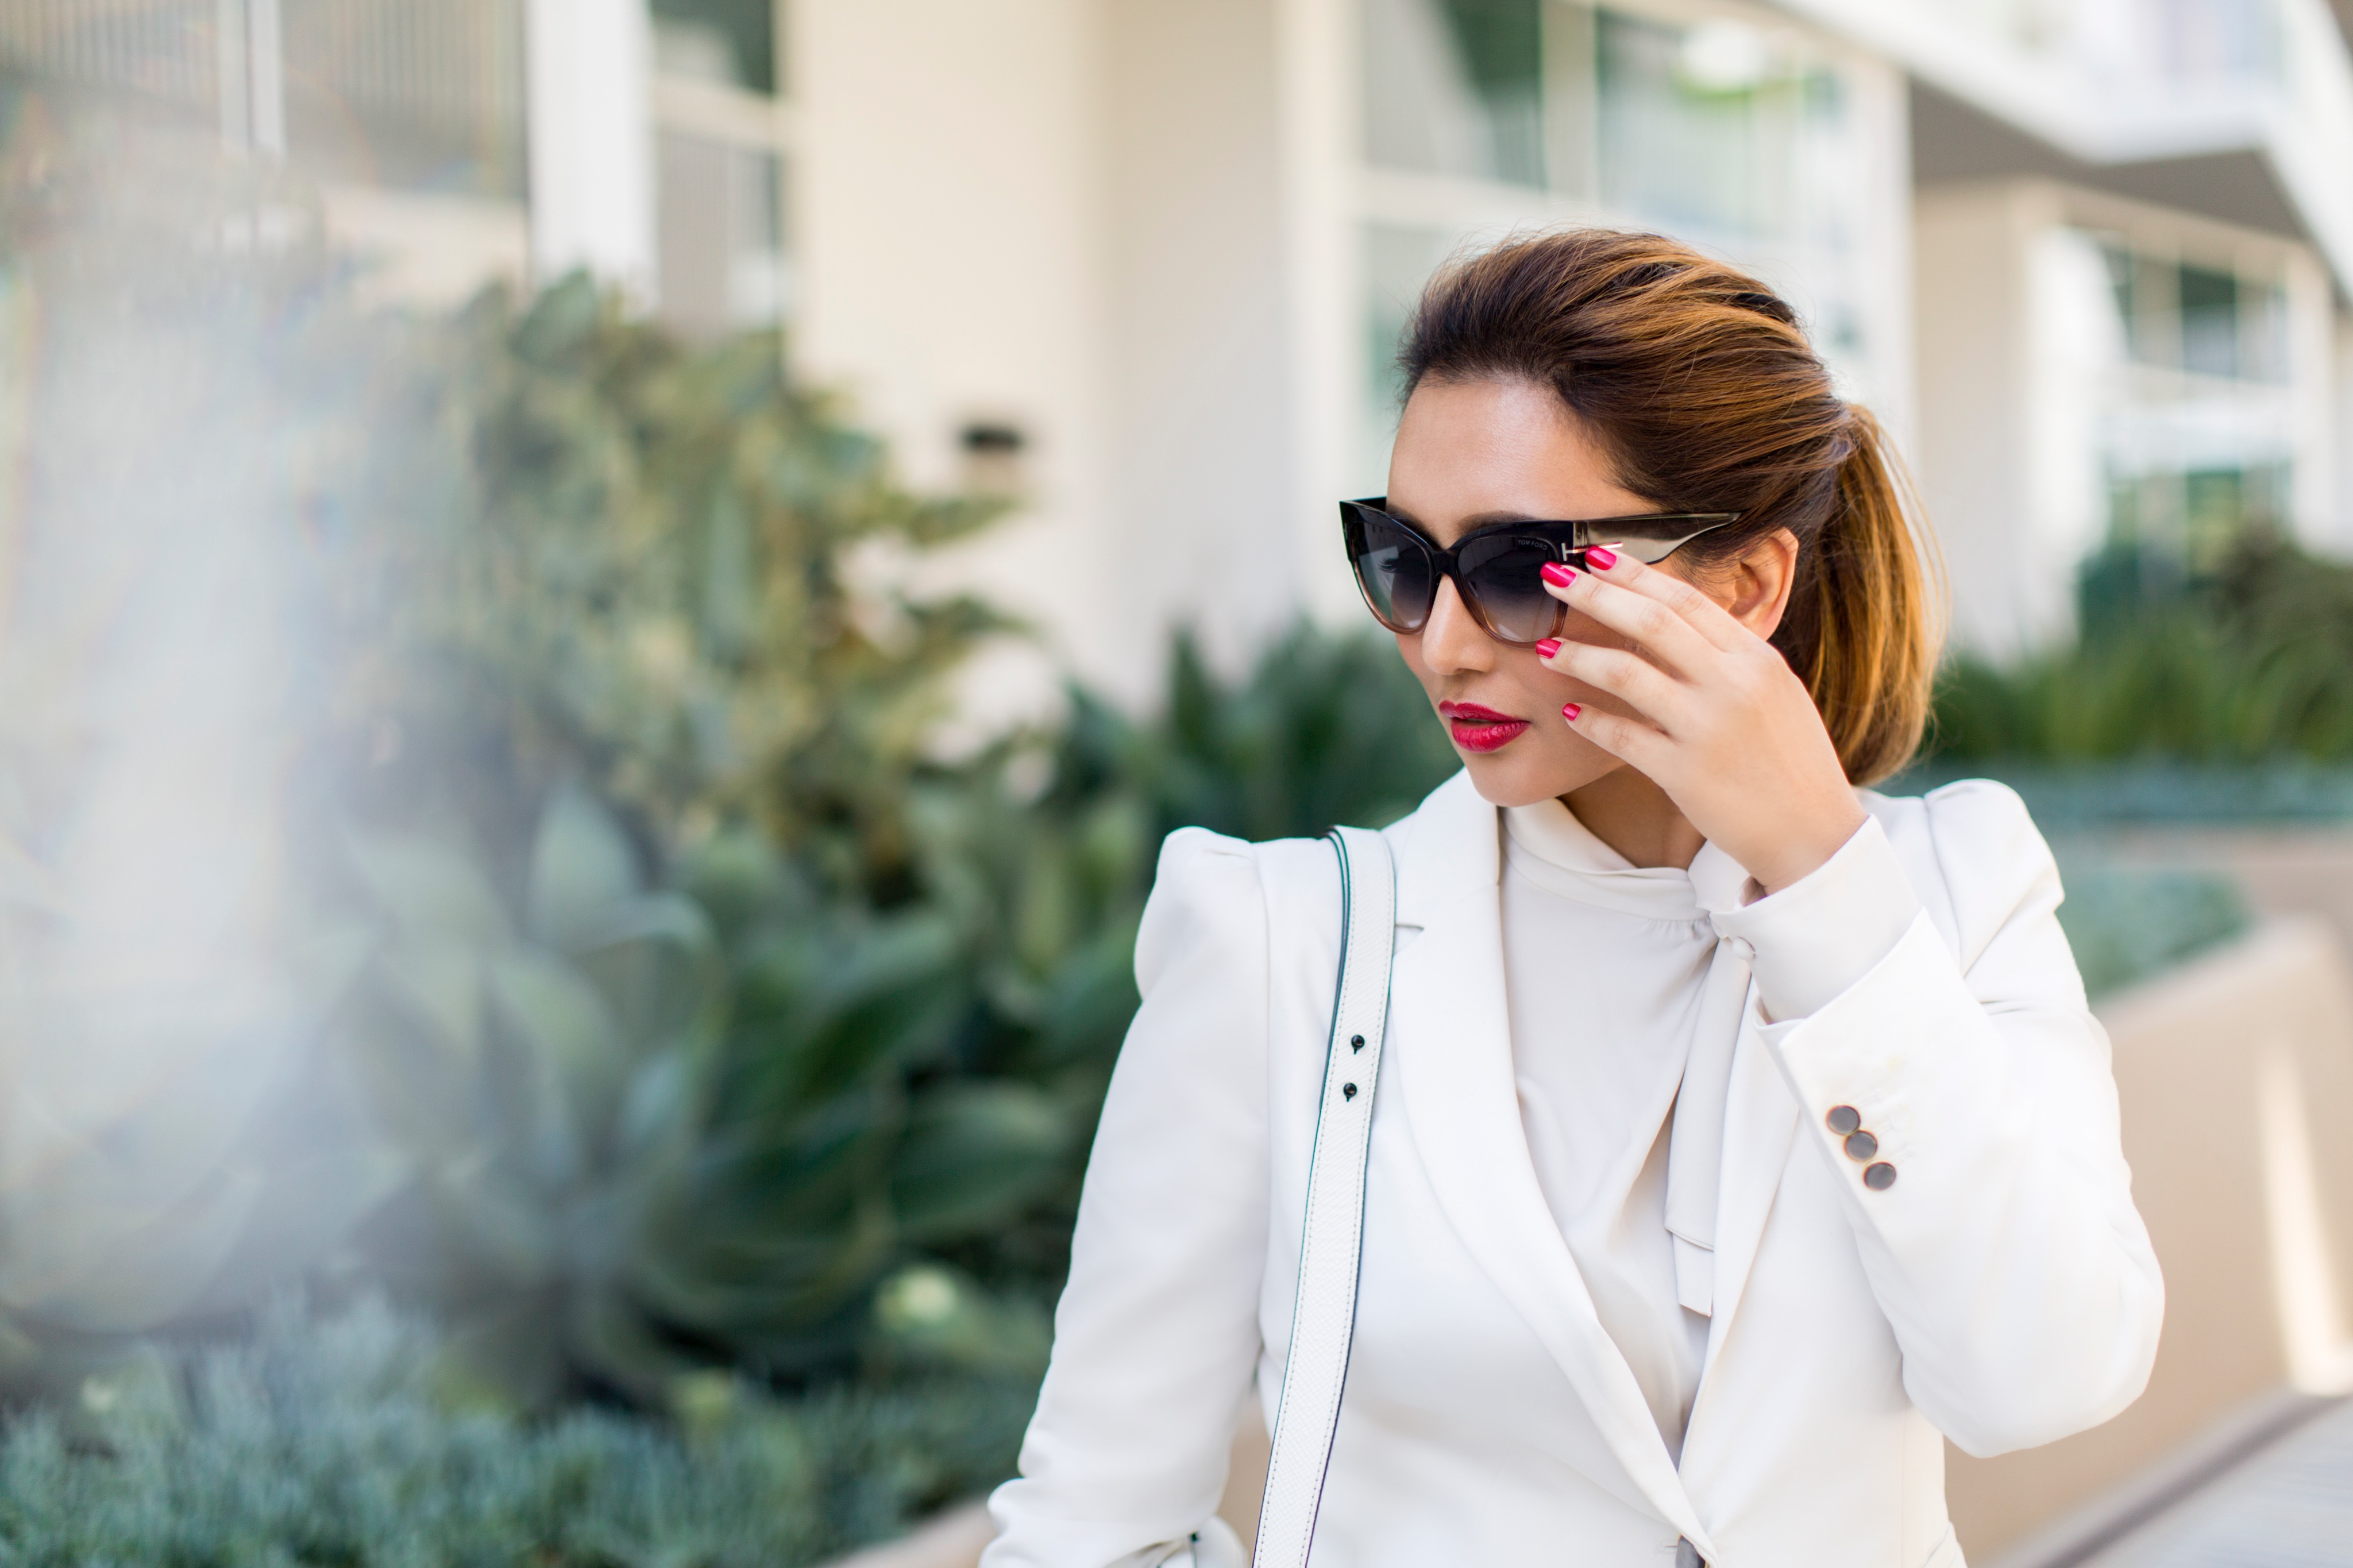 Stylish Fashionable Businesswoman